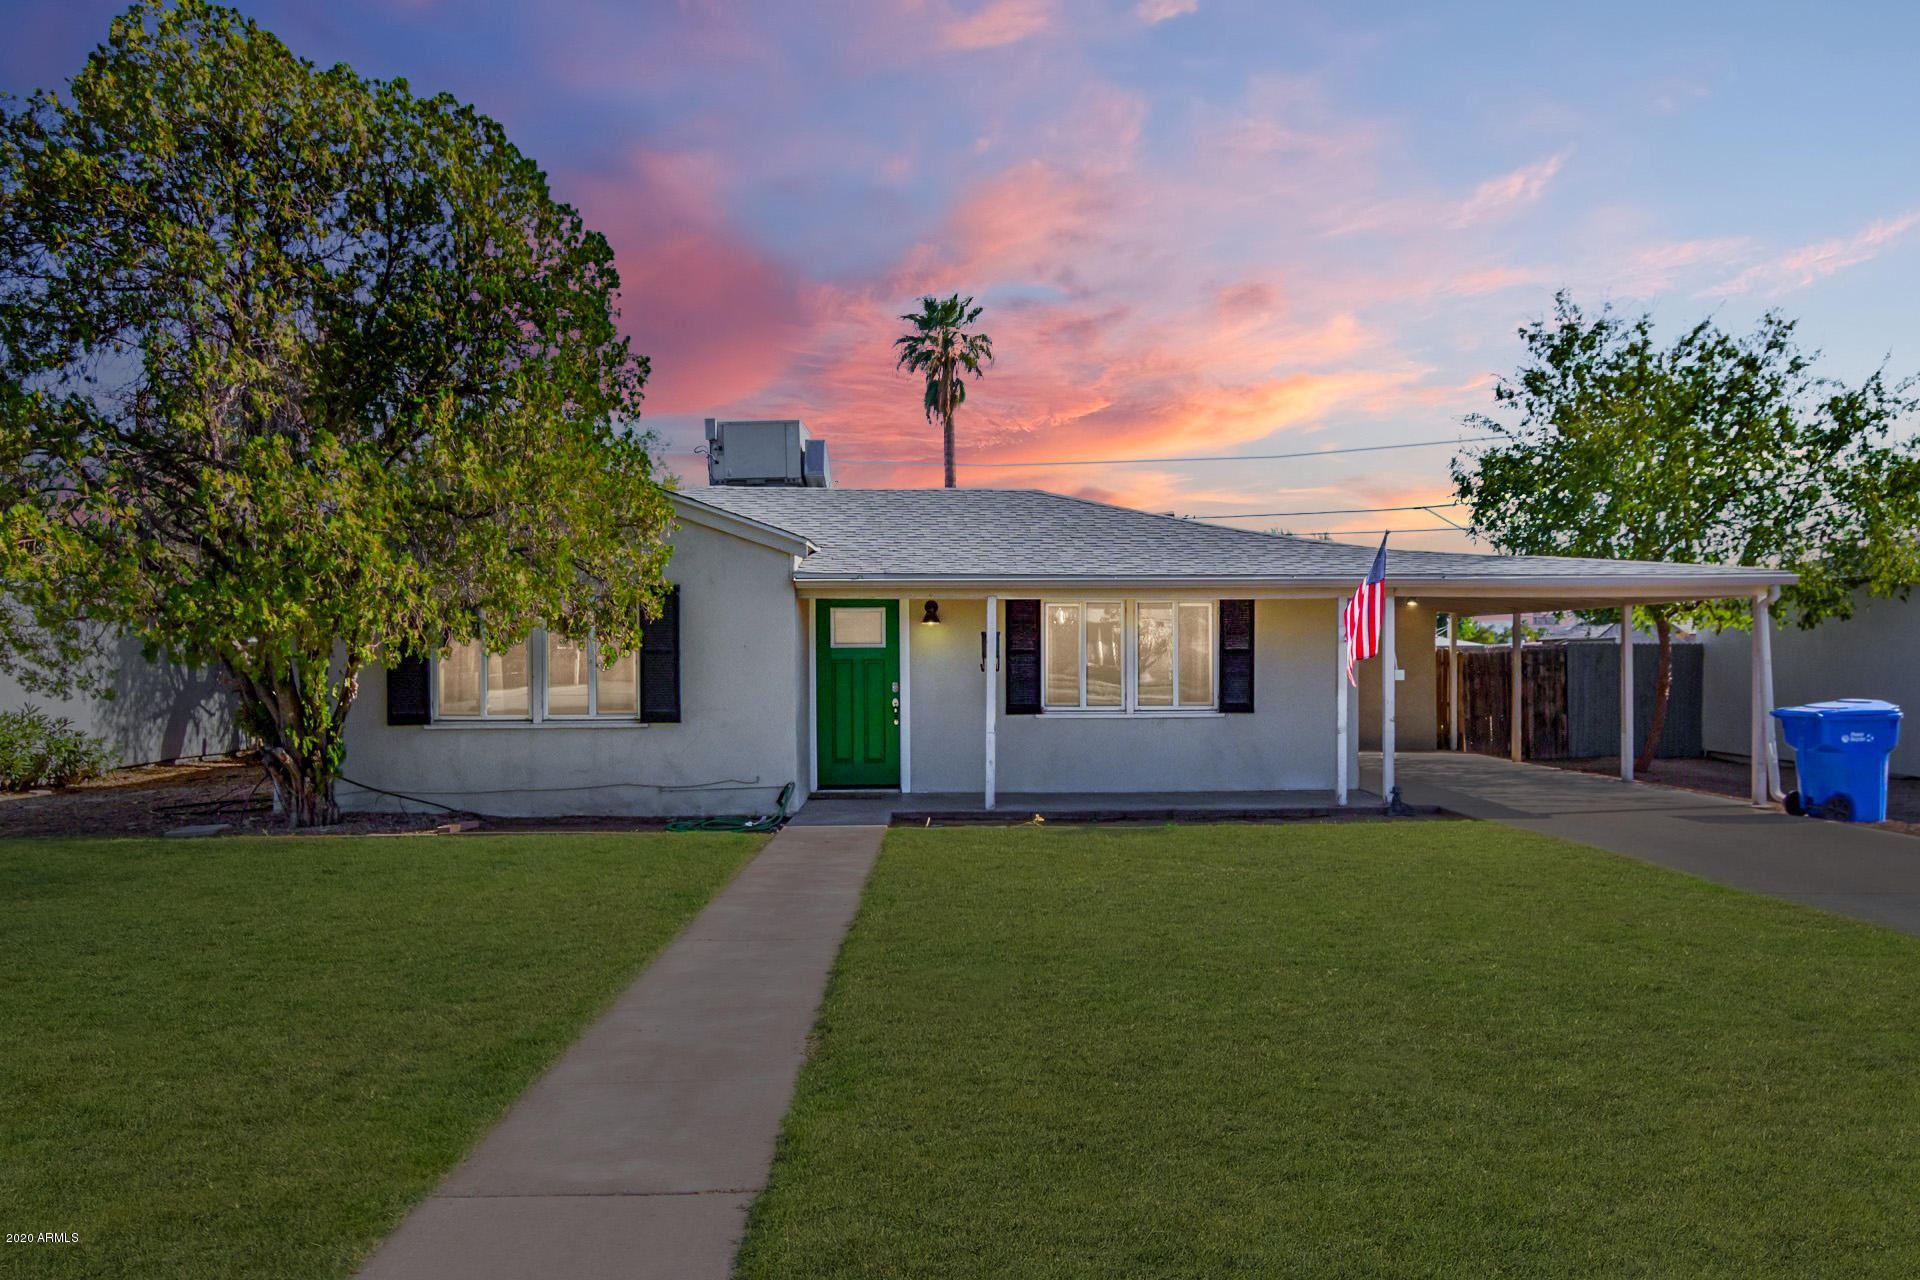 1819 E FAIRMOUNT Avenue, Phoenix, AZ 85016 - MLS#: 6128697